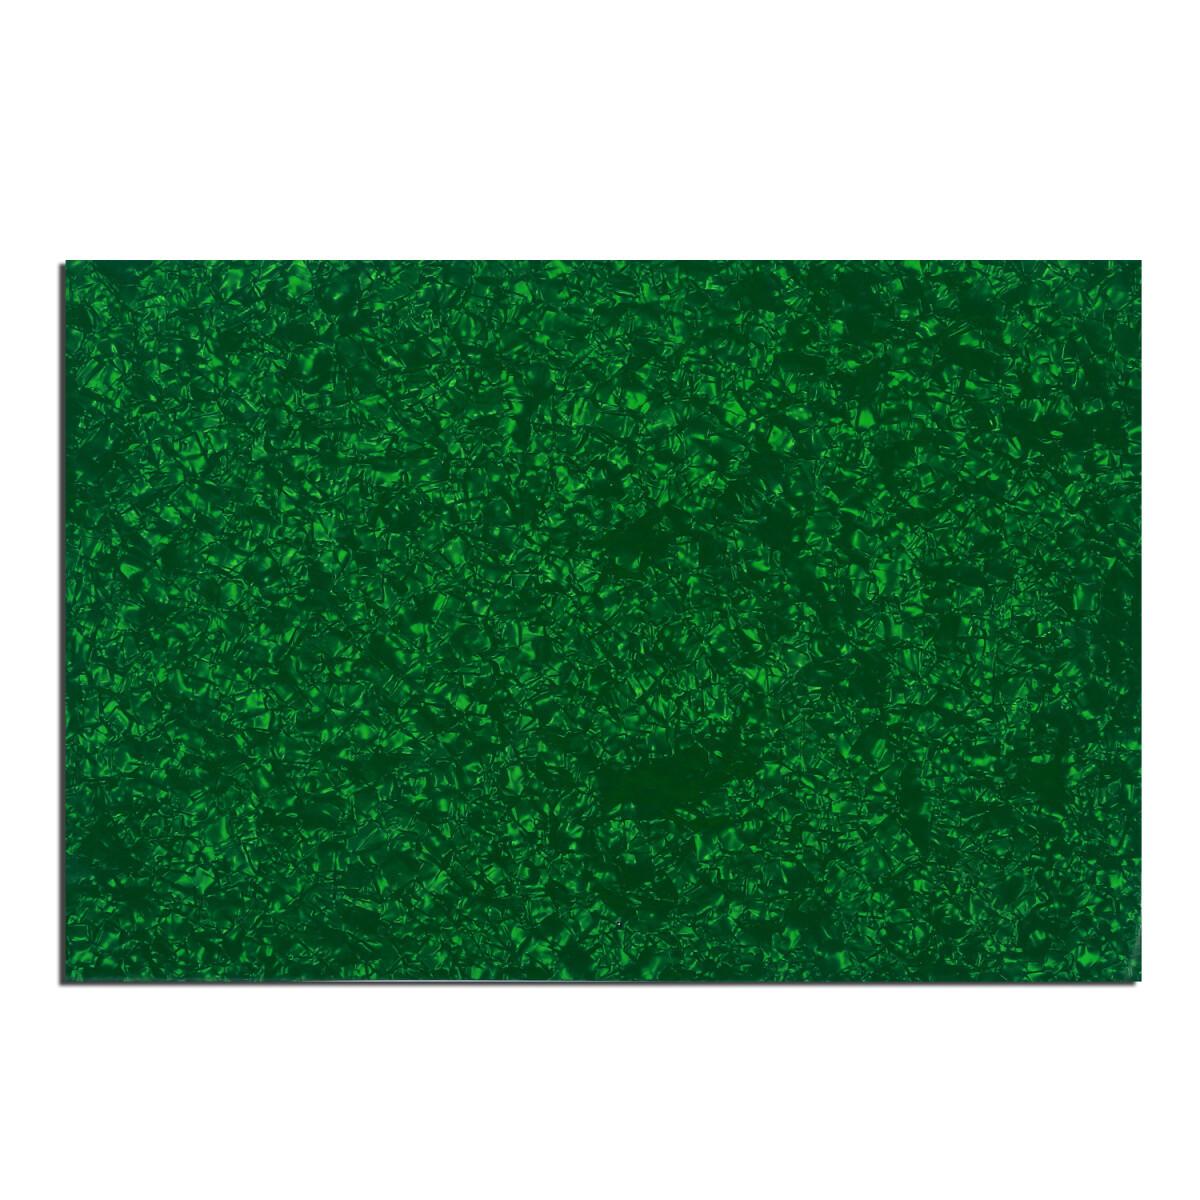 "Brio Pickguard Blanks 12"" x 17"" 4 Ply Pearloid Green"